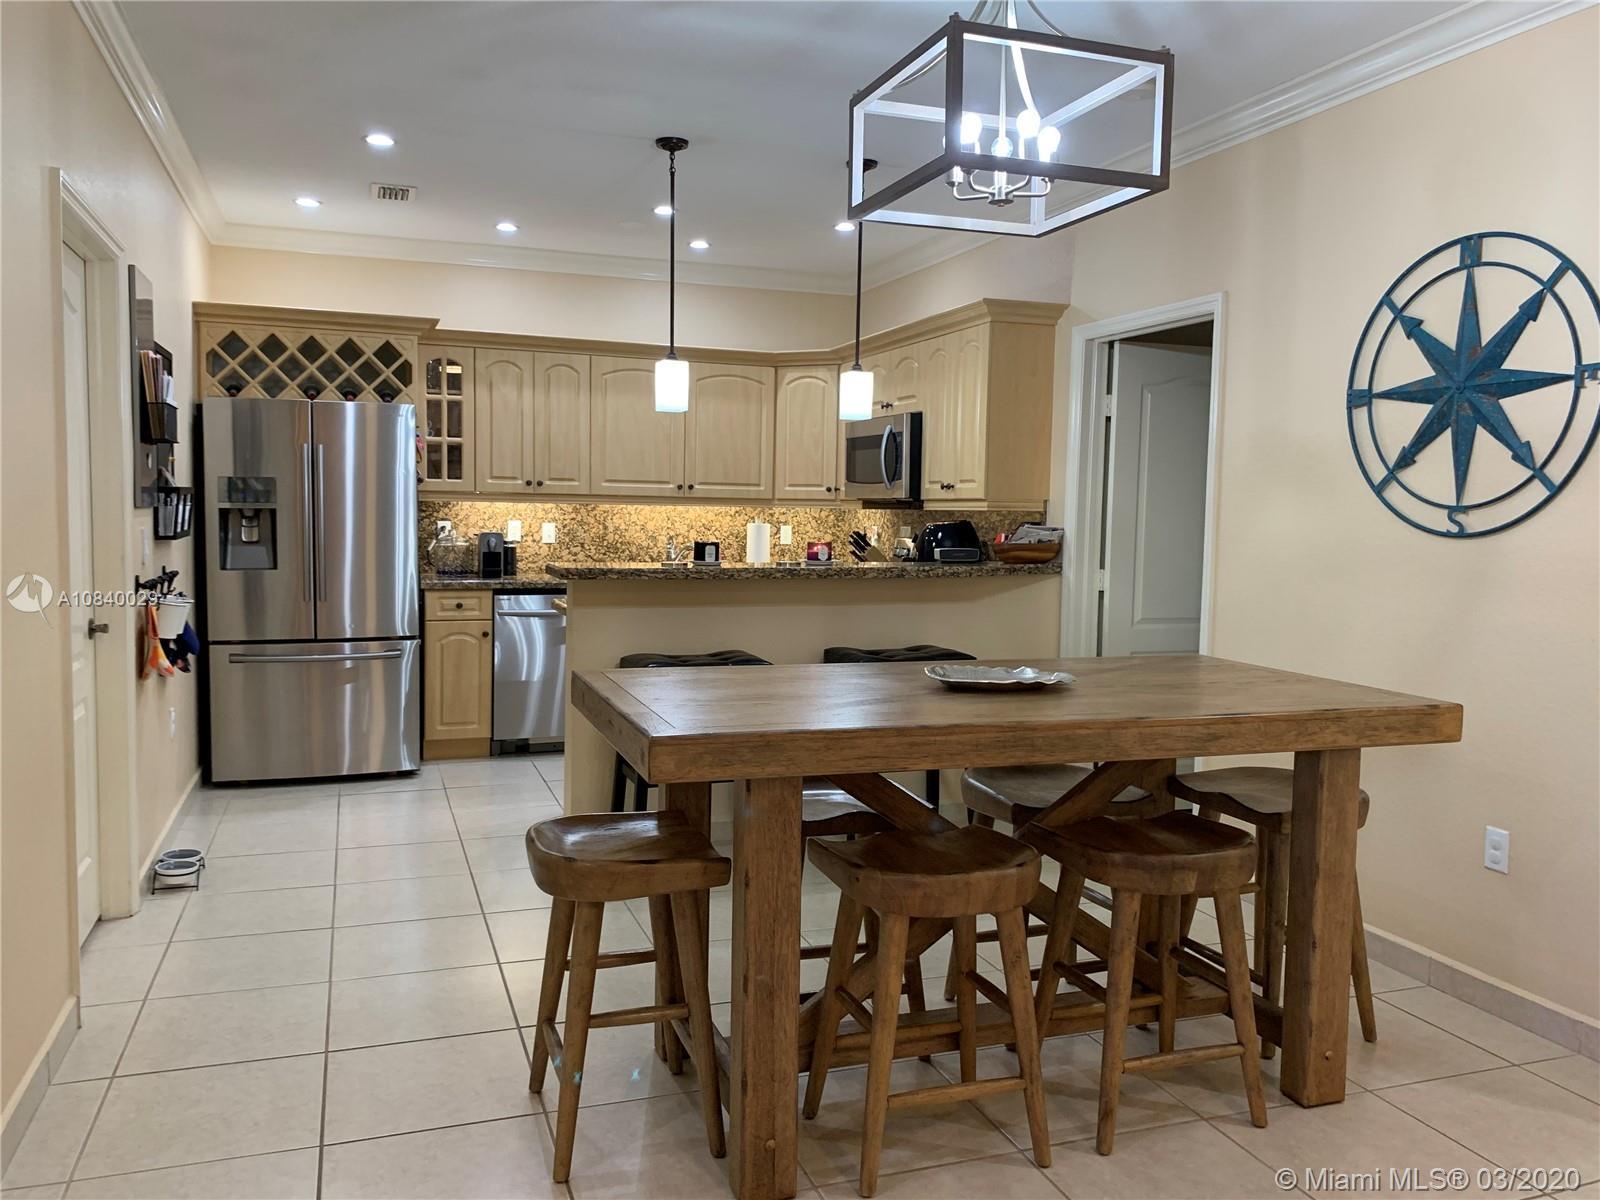 7580 NW 176th St #7580, Hialeah, FL 33015 - Hialeah, FL real estate listing